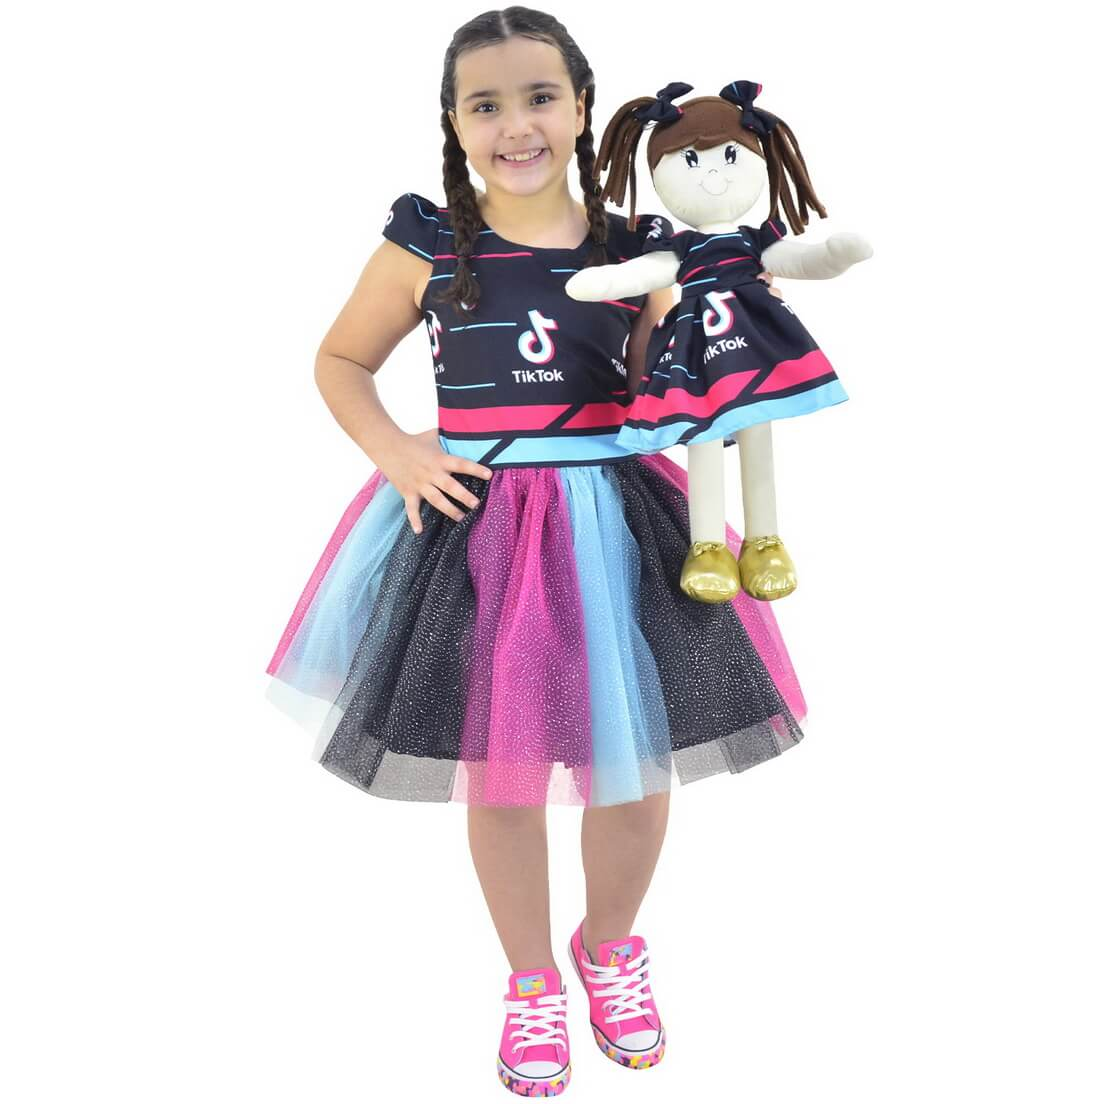 Tal Menina Tal Boneca Mari - Vestido infantil TikTok (Tik Tok)